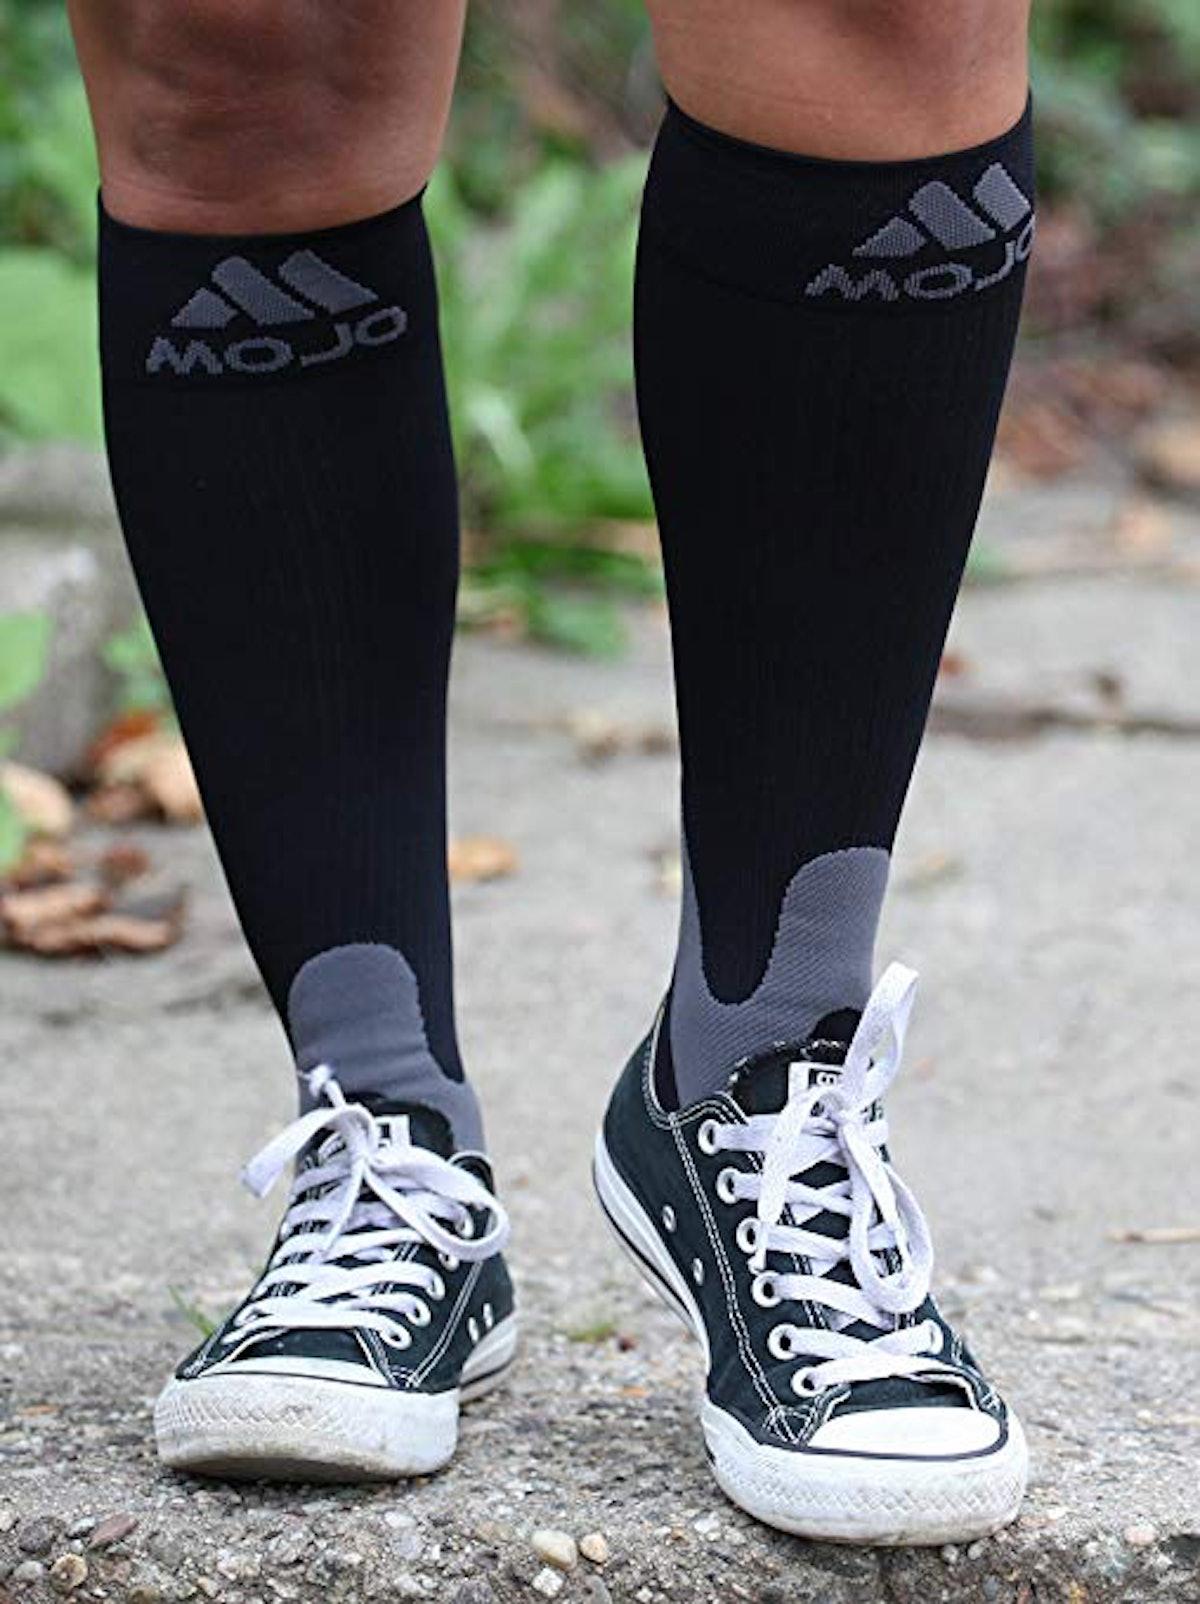 Mojo Compression Socks For Men And Women